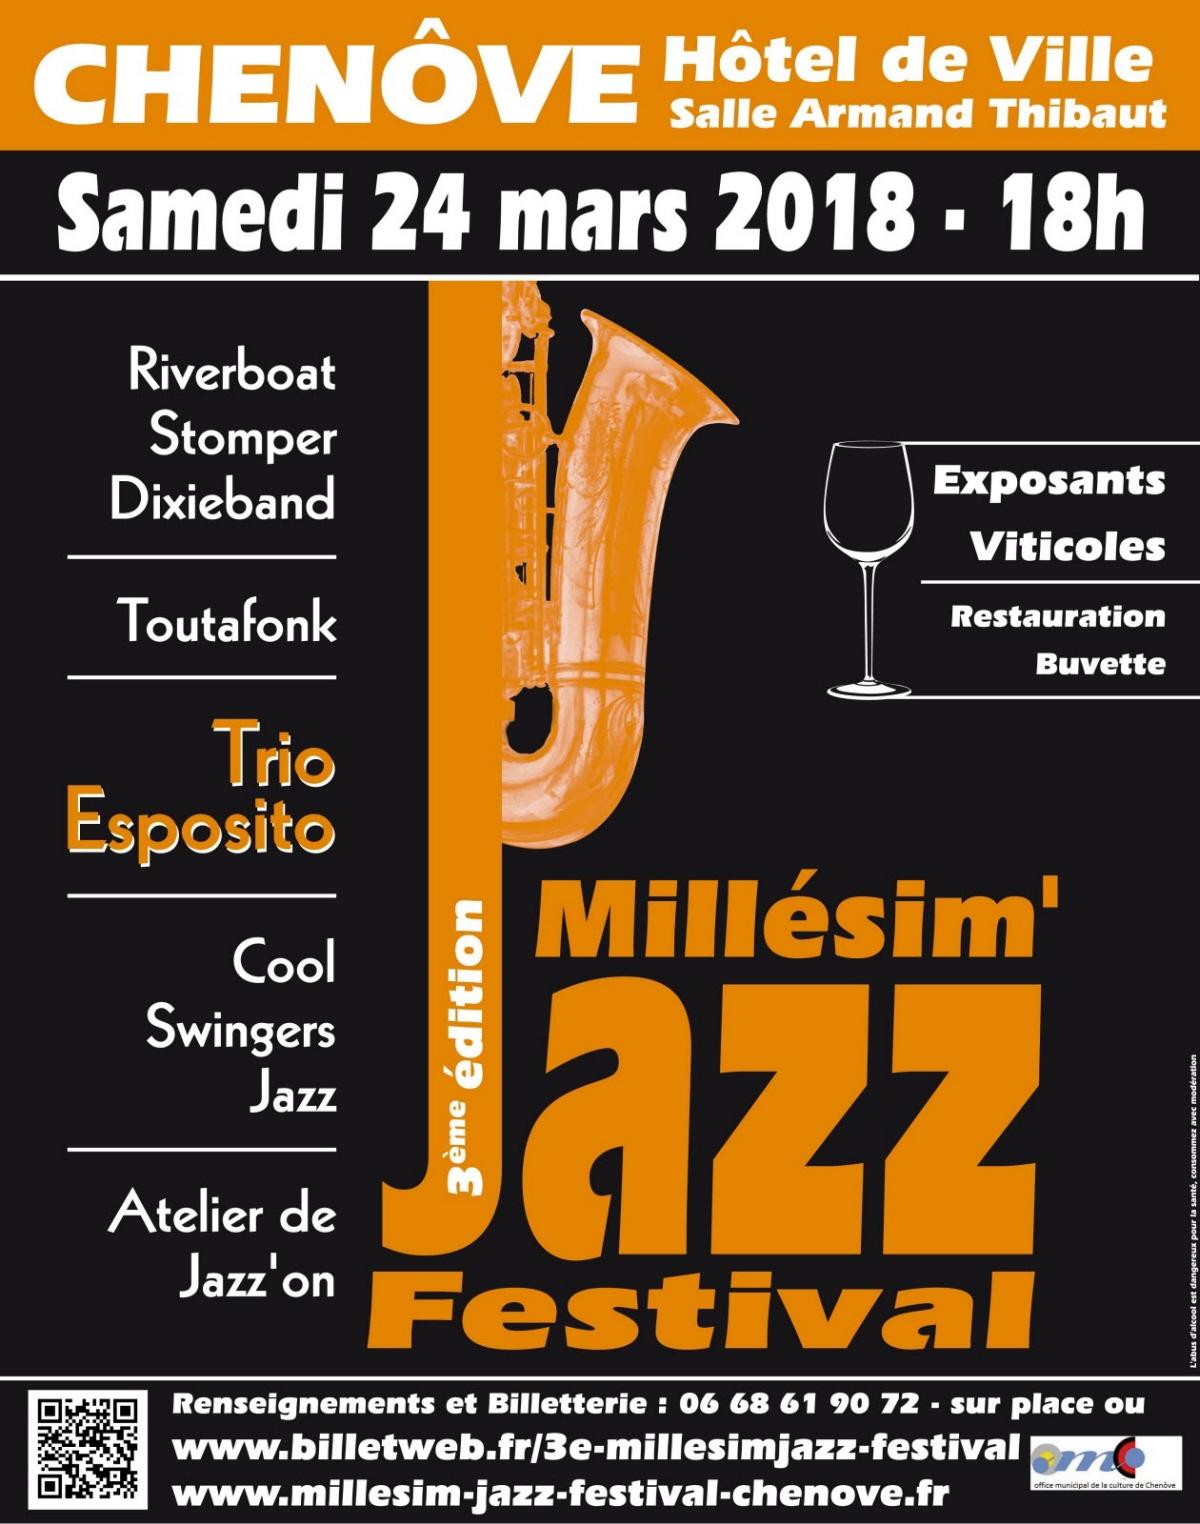 3 me festival de jazz de chen ve samedi 24 mars 2018 18h site internet de la fnasce des. Black Bedroom Furniture Sets. Home Design Ideas